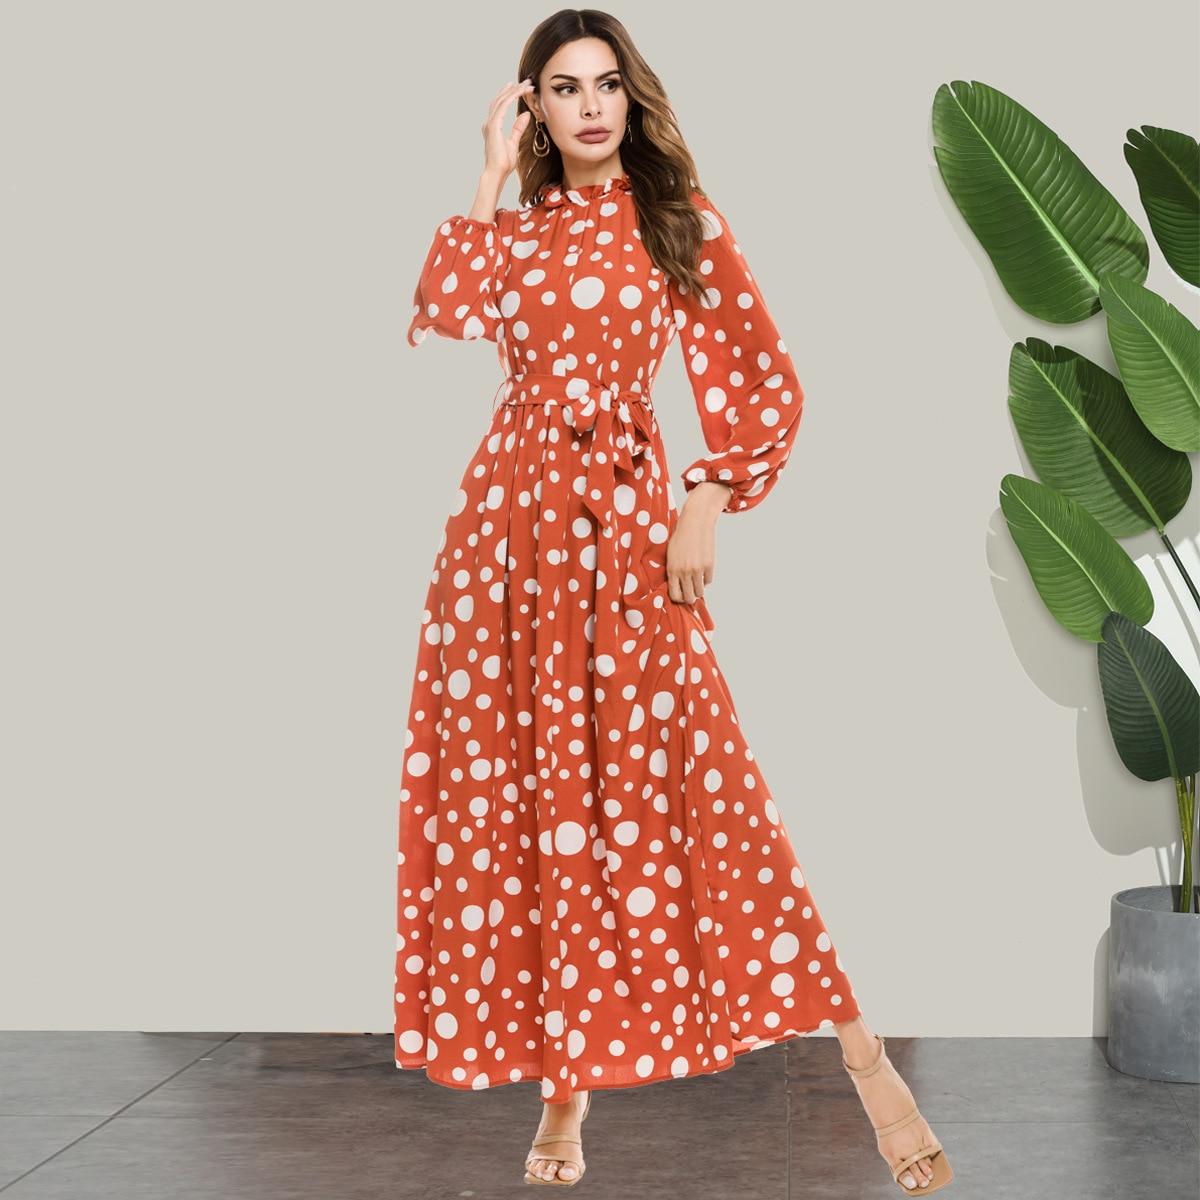 moroccan kaftan muslim women dress long sleeve pa-line abaya dresses UAE ramadan islamic clothing big swing print plus size robe